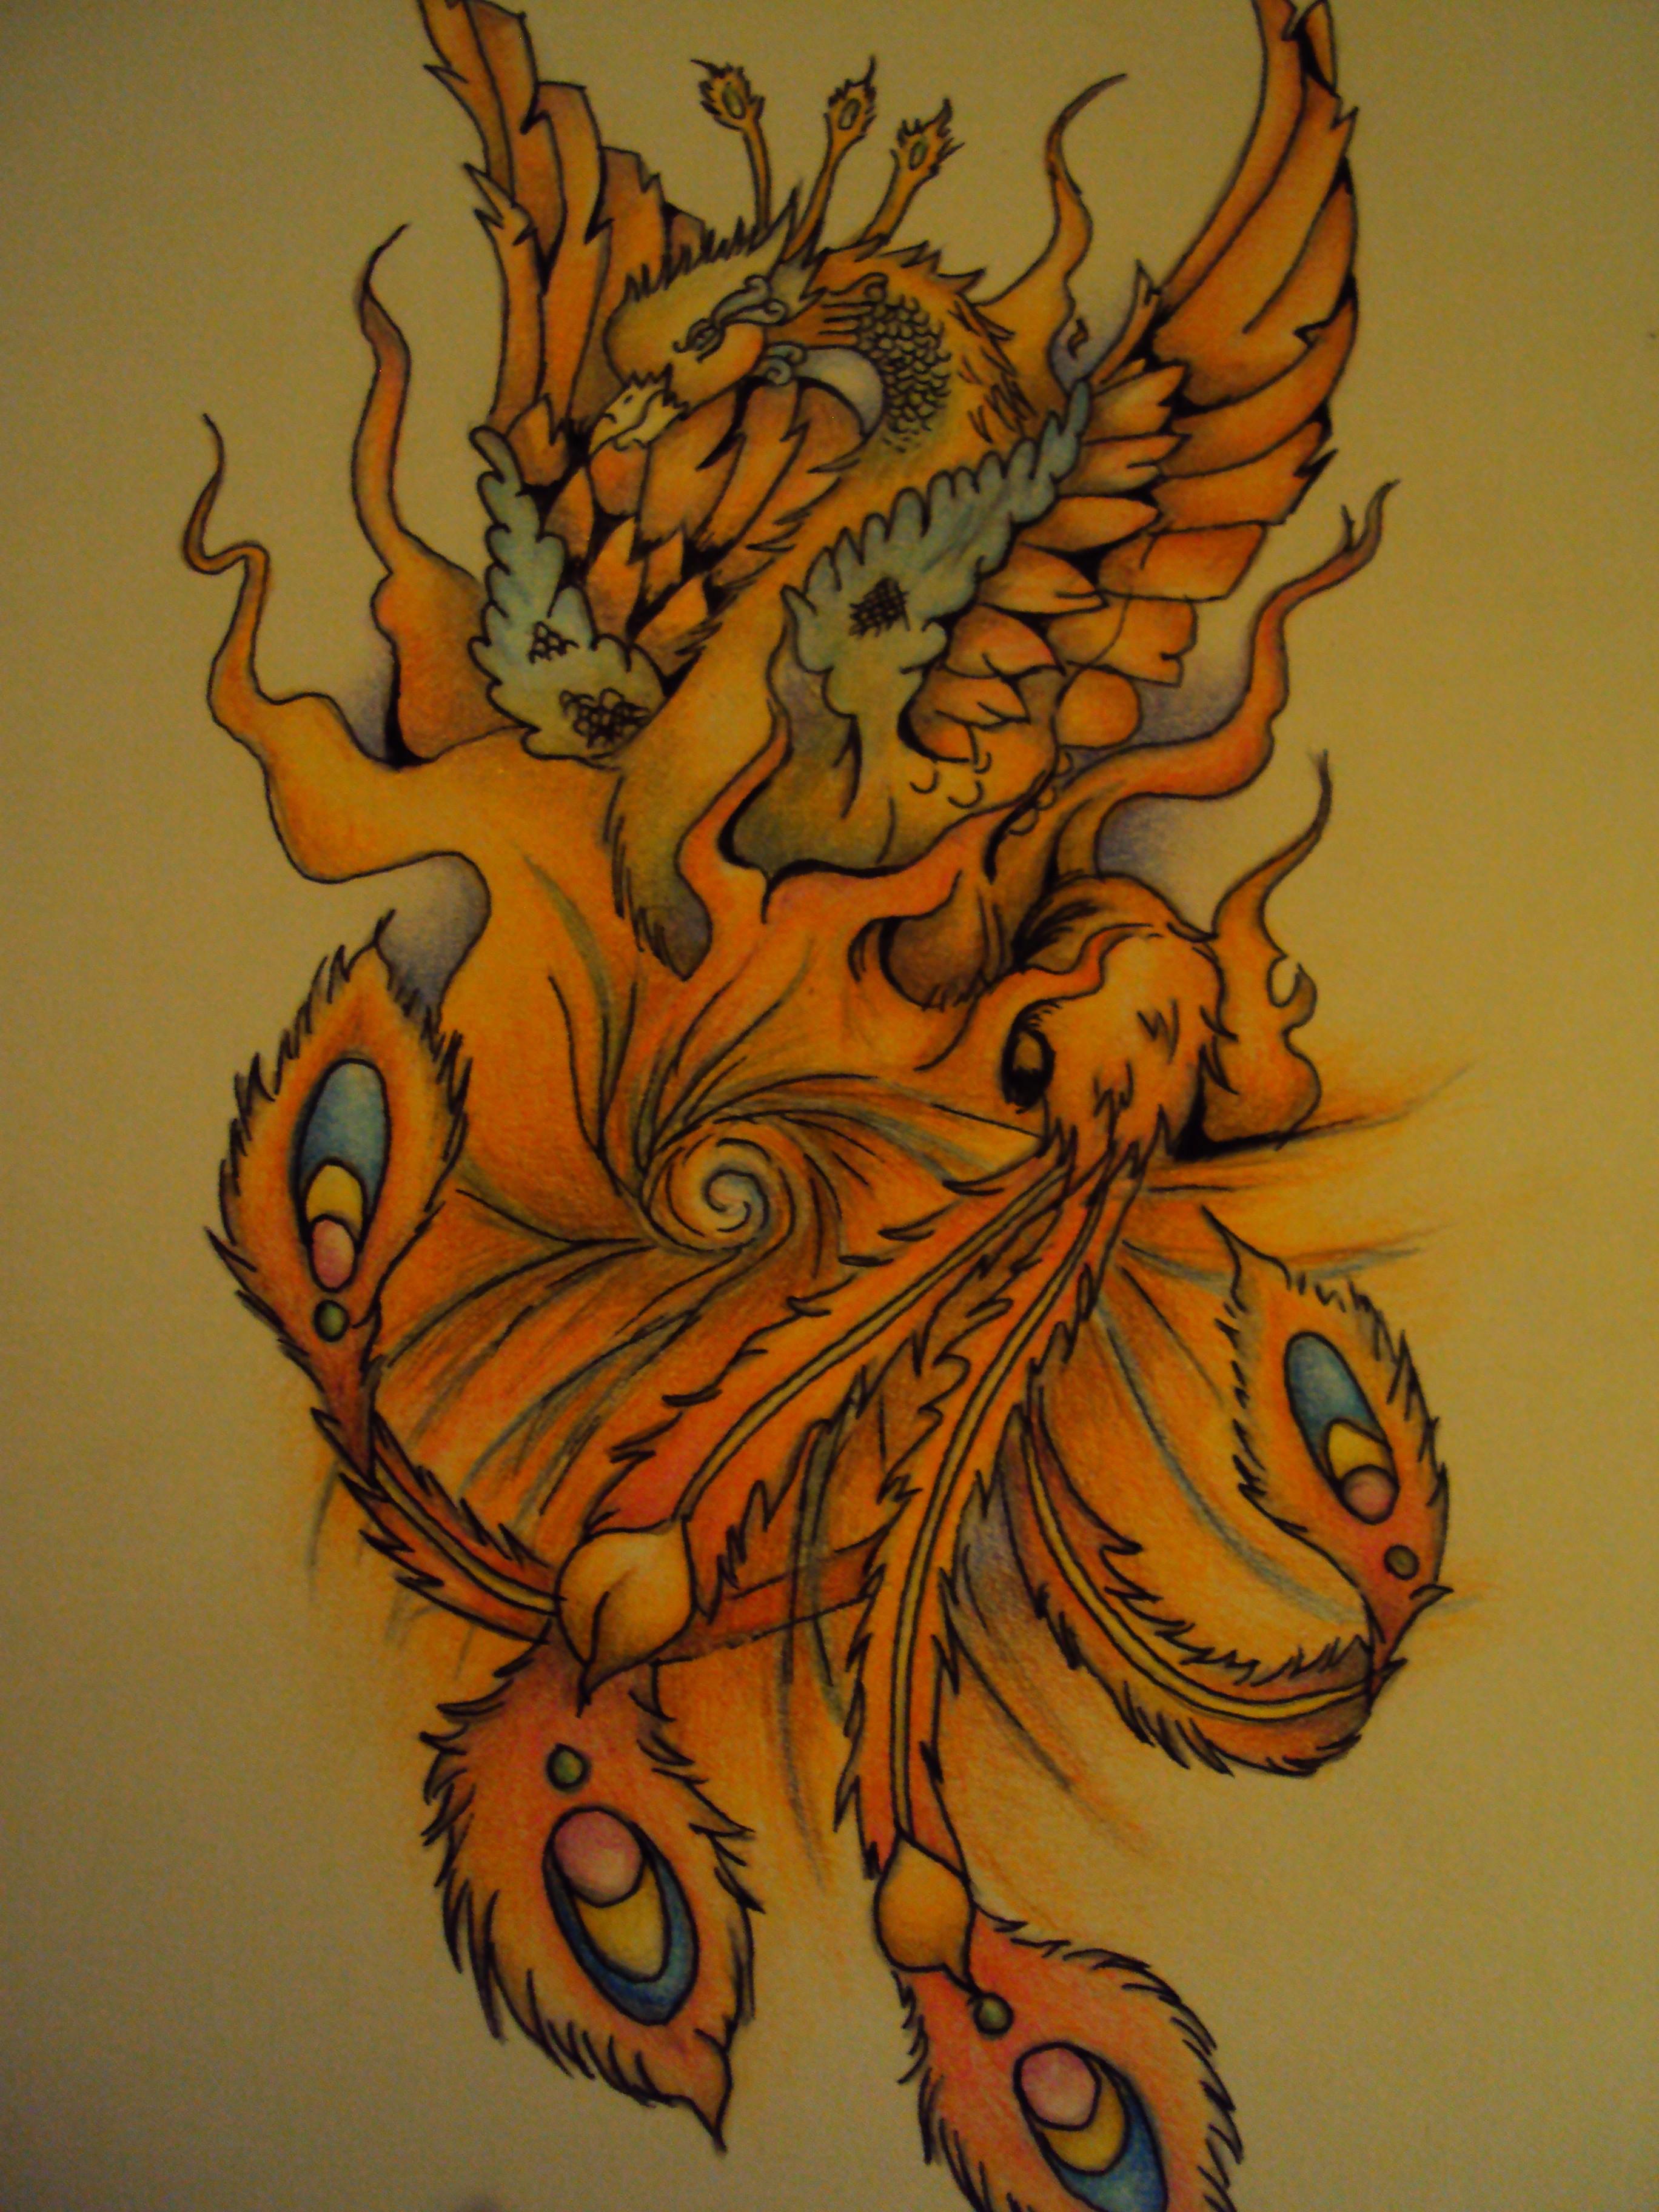 dessin-phoenix-big.jpg